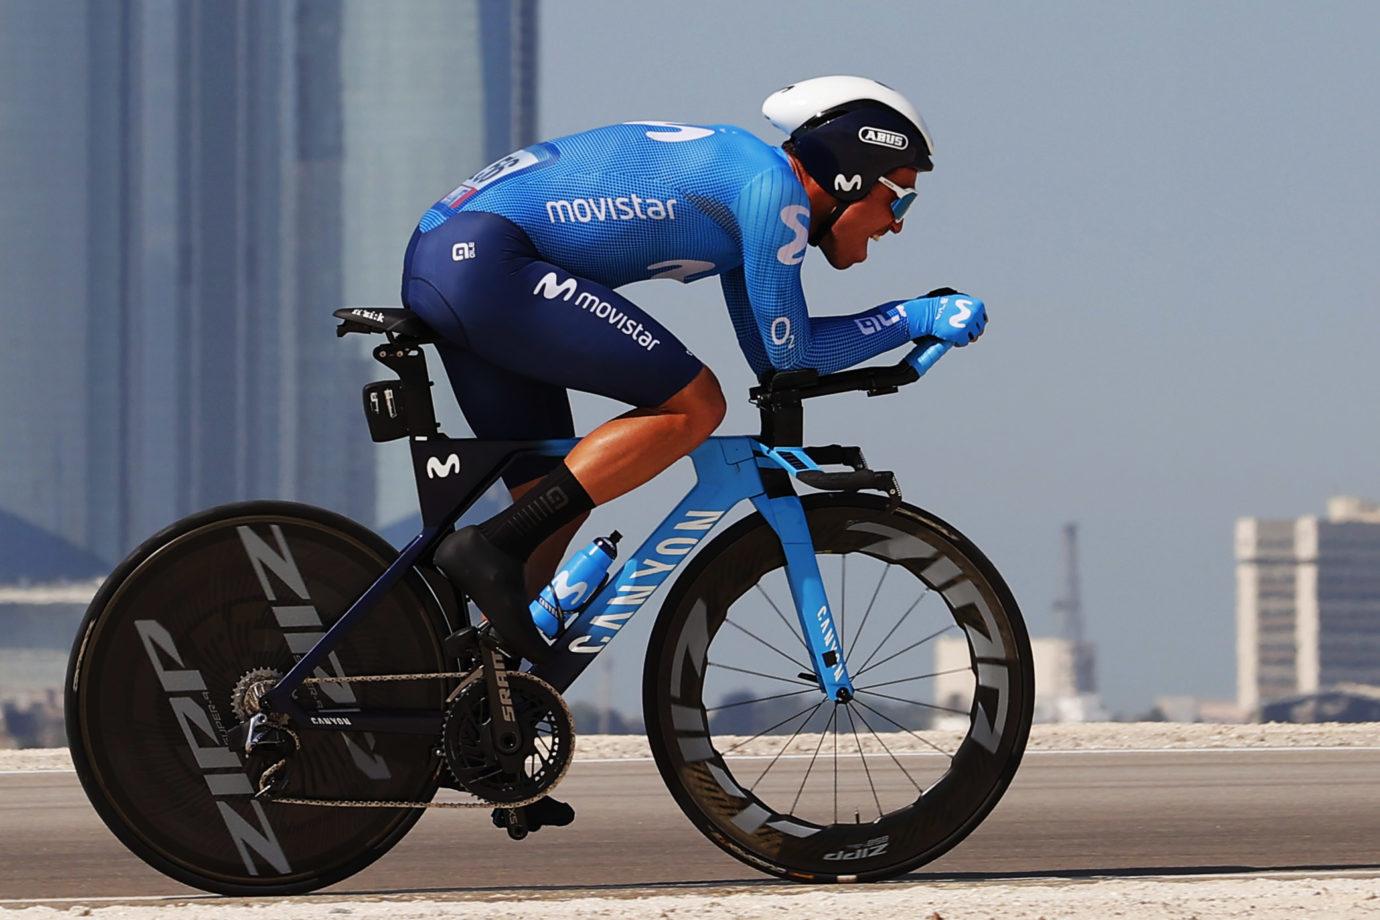 Imagen de la noticia 'Track specialist Torres top Movistar Team performer at fast-paced ITT'